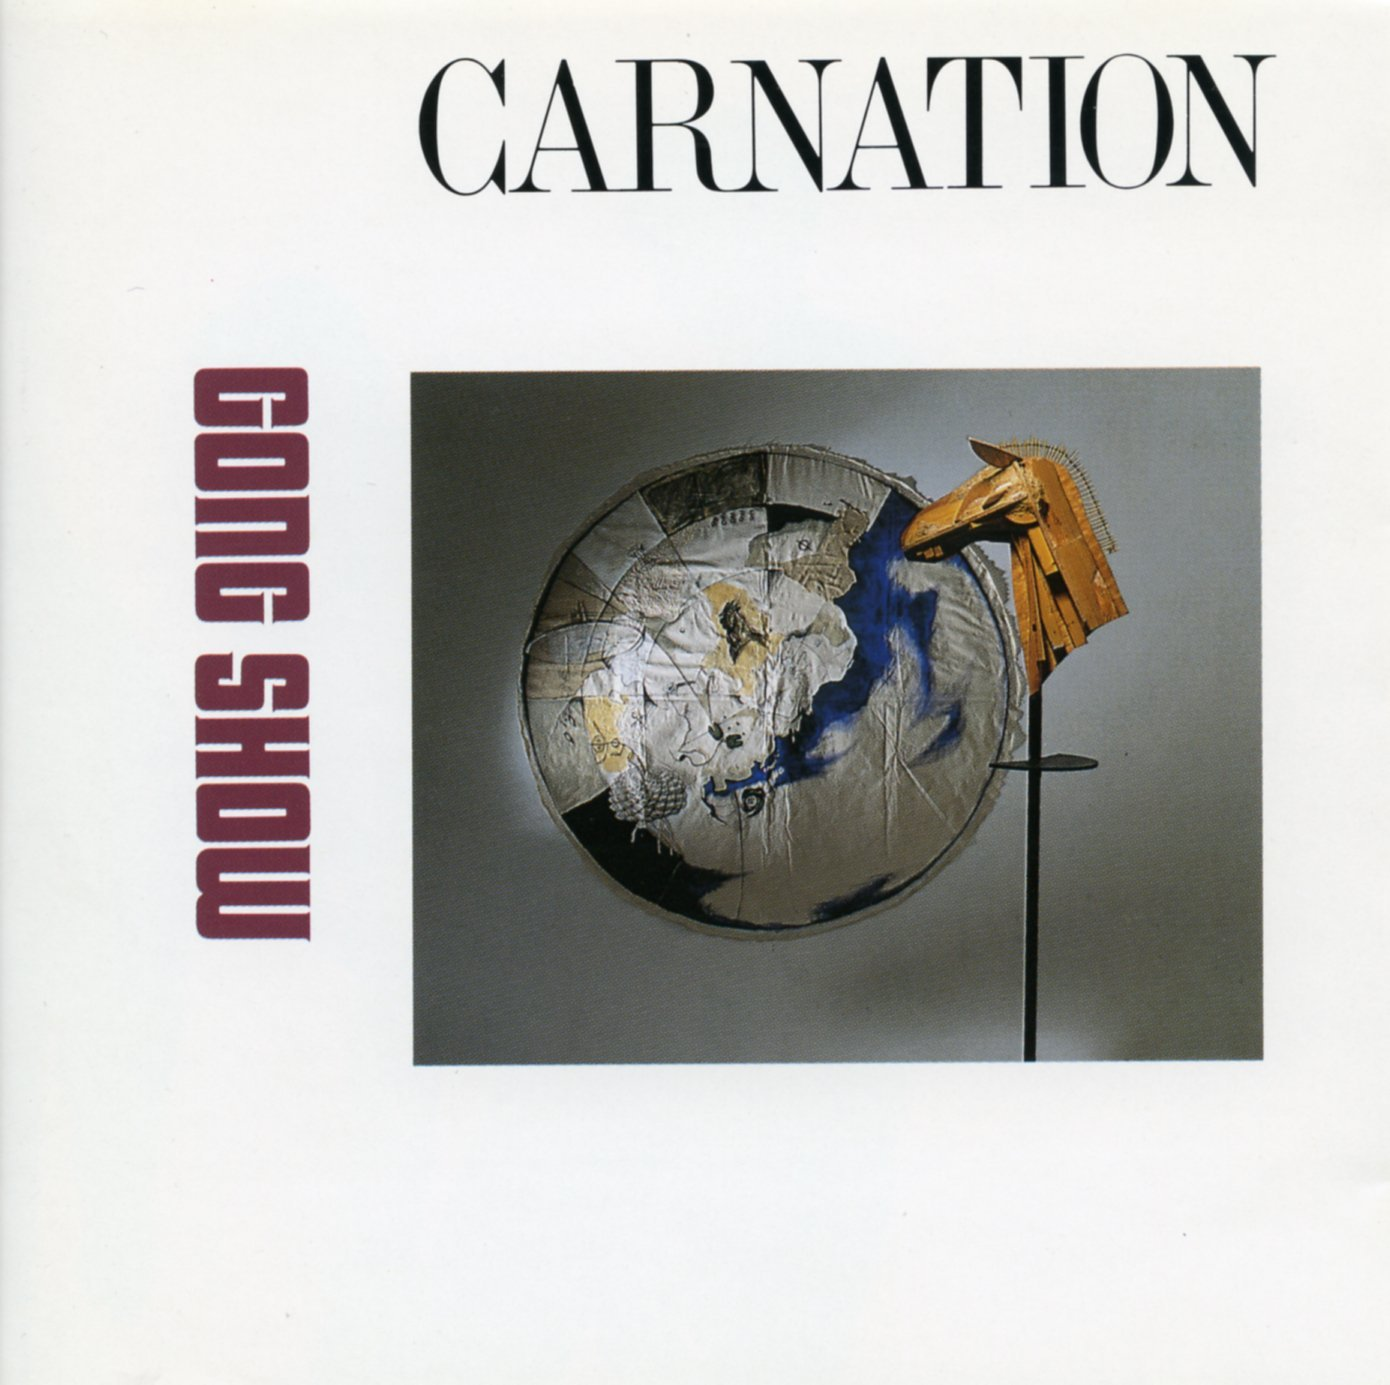 GONG SHOW / Carnationのジャケット